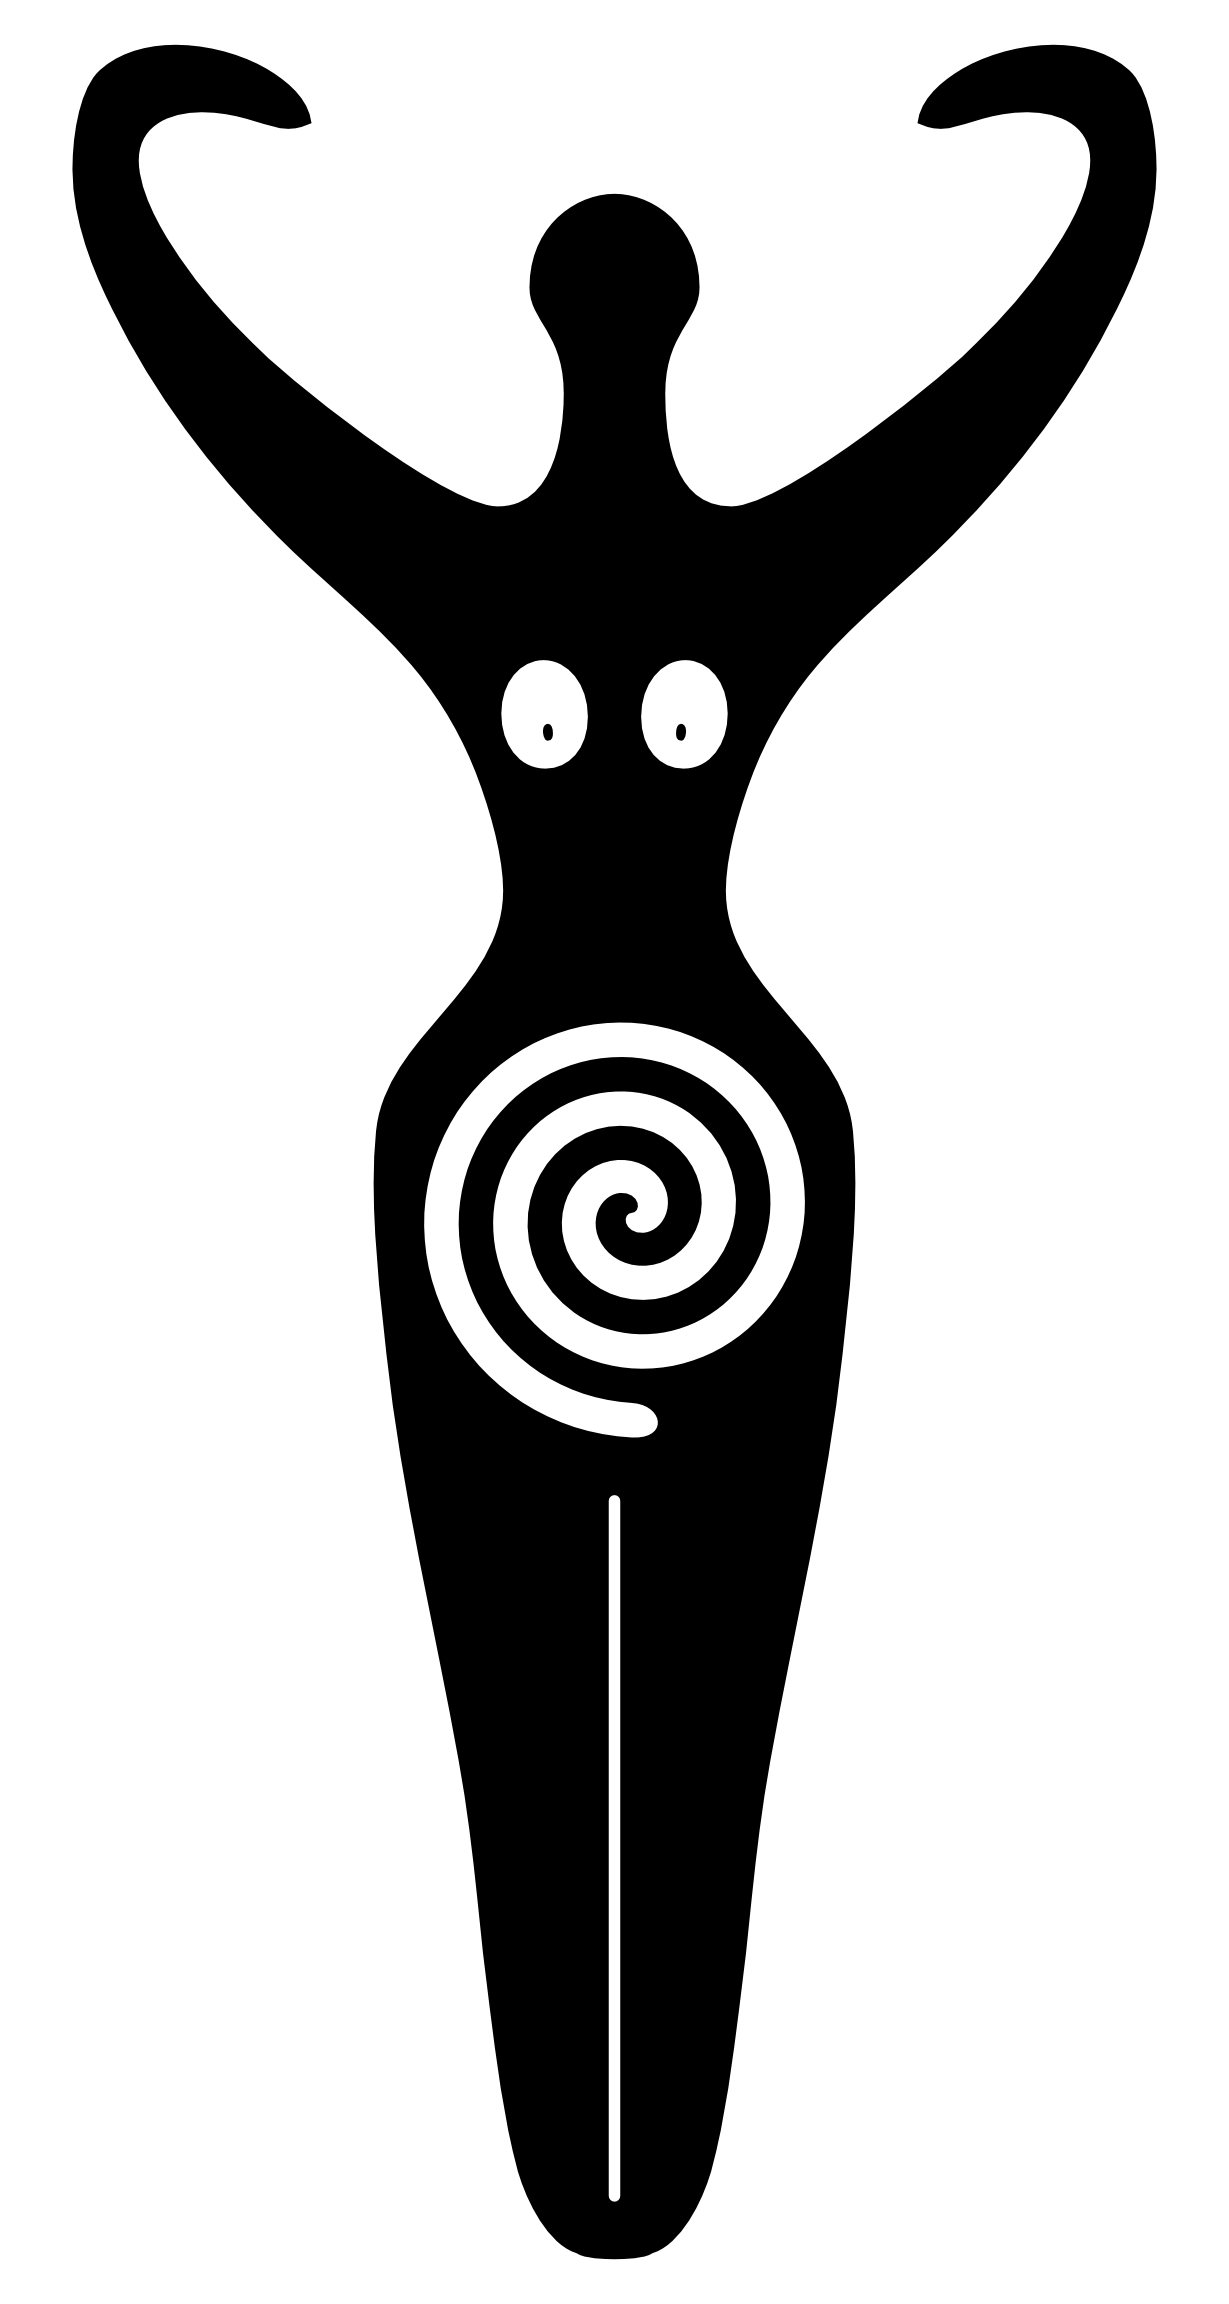 Httpclipartistfoclipartcommonsmediaegypt spiral goddess symbol neo pagan goddess movement wikipedia the free encyclopedia biocorpaavc Images